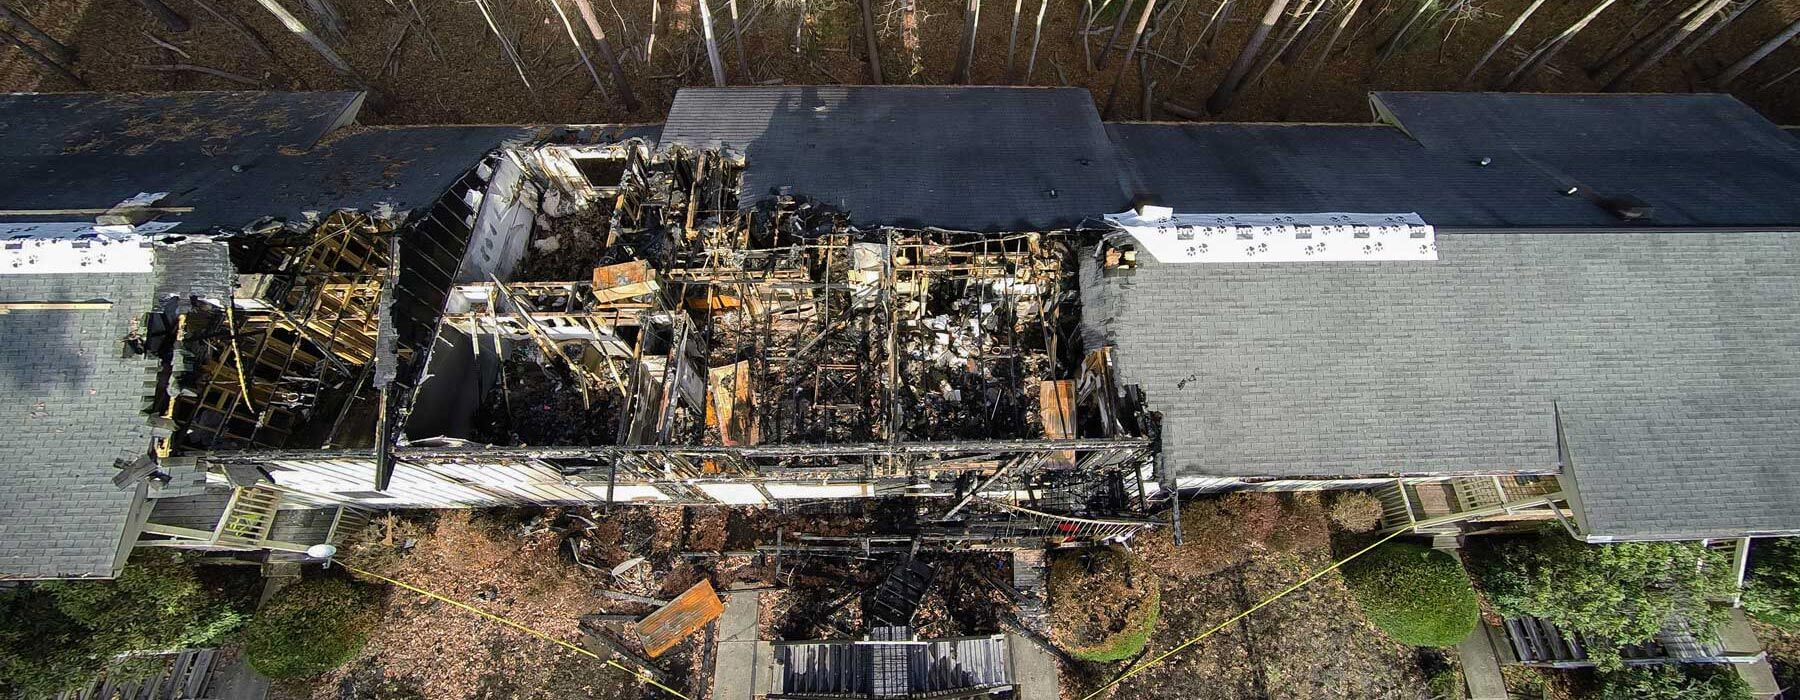 Fire Damage Restoration in Rockingham, NC